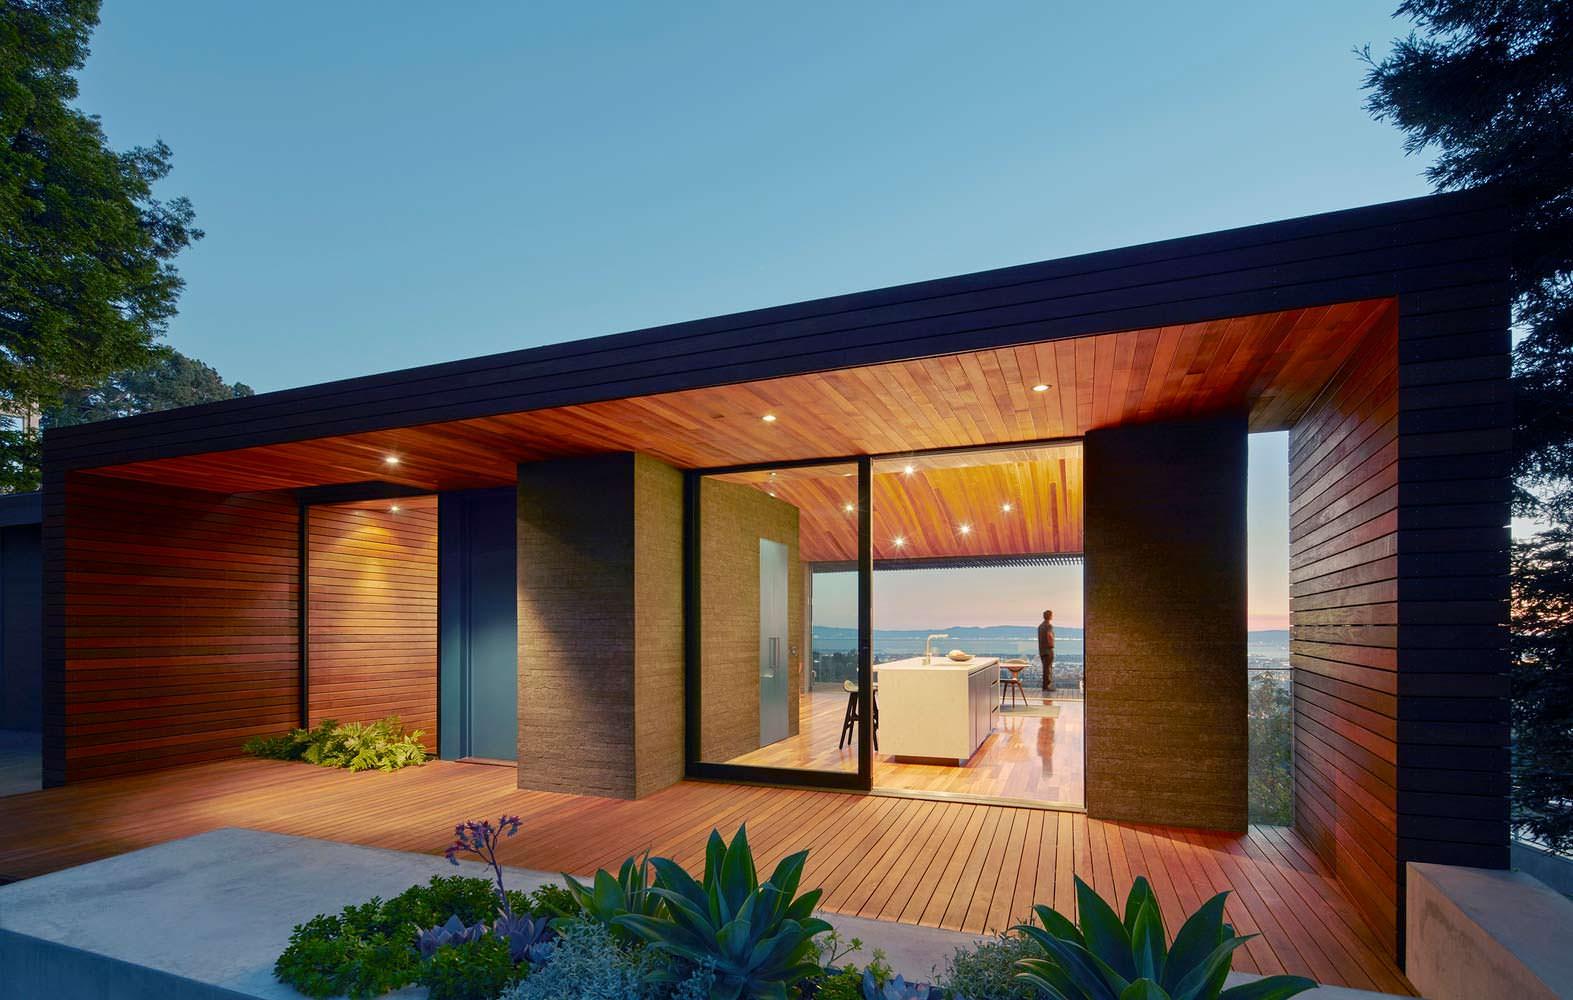 Панорамный дом в Калифорнии. Проект Terry & Terry Architecture